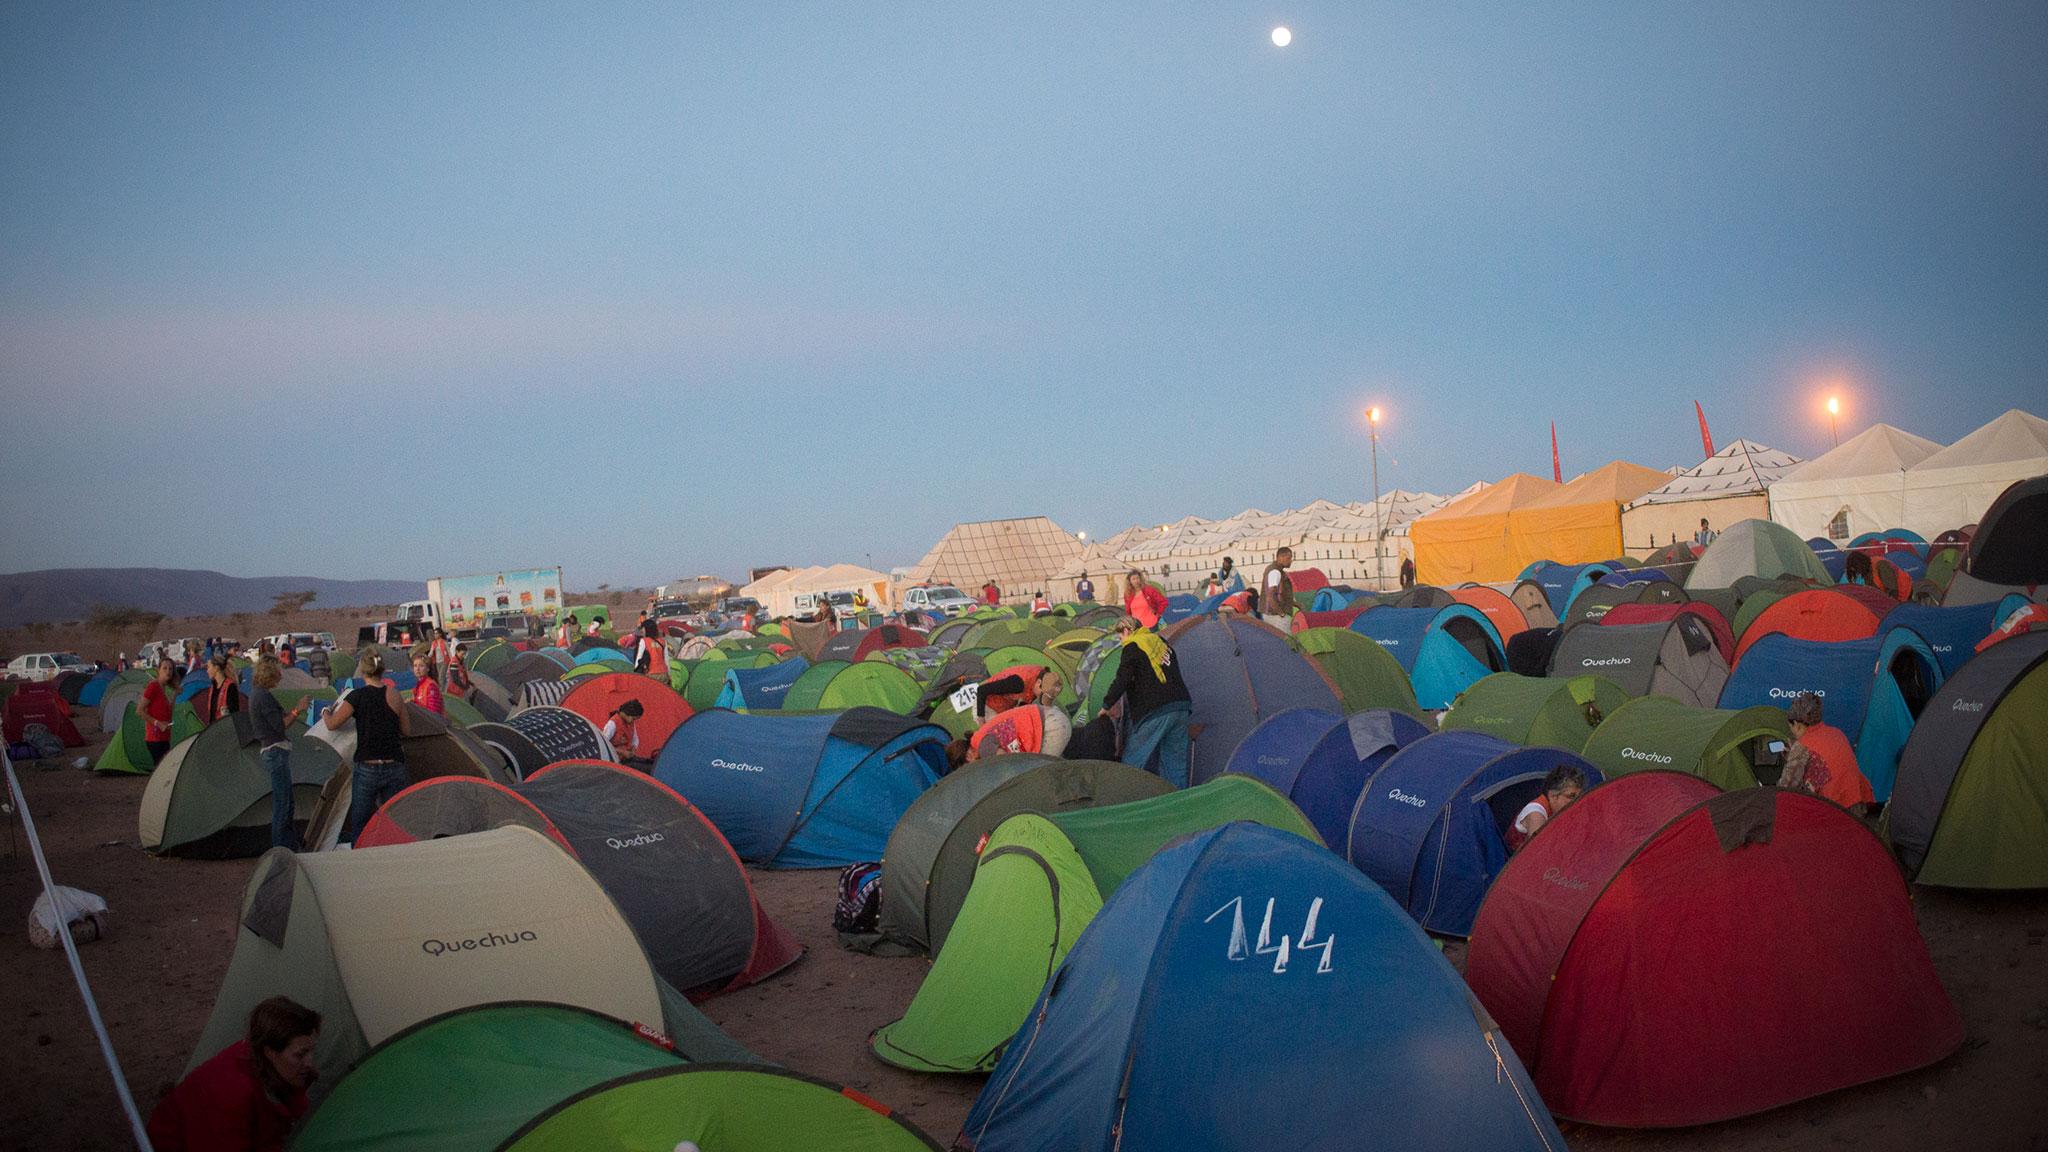 Camp City